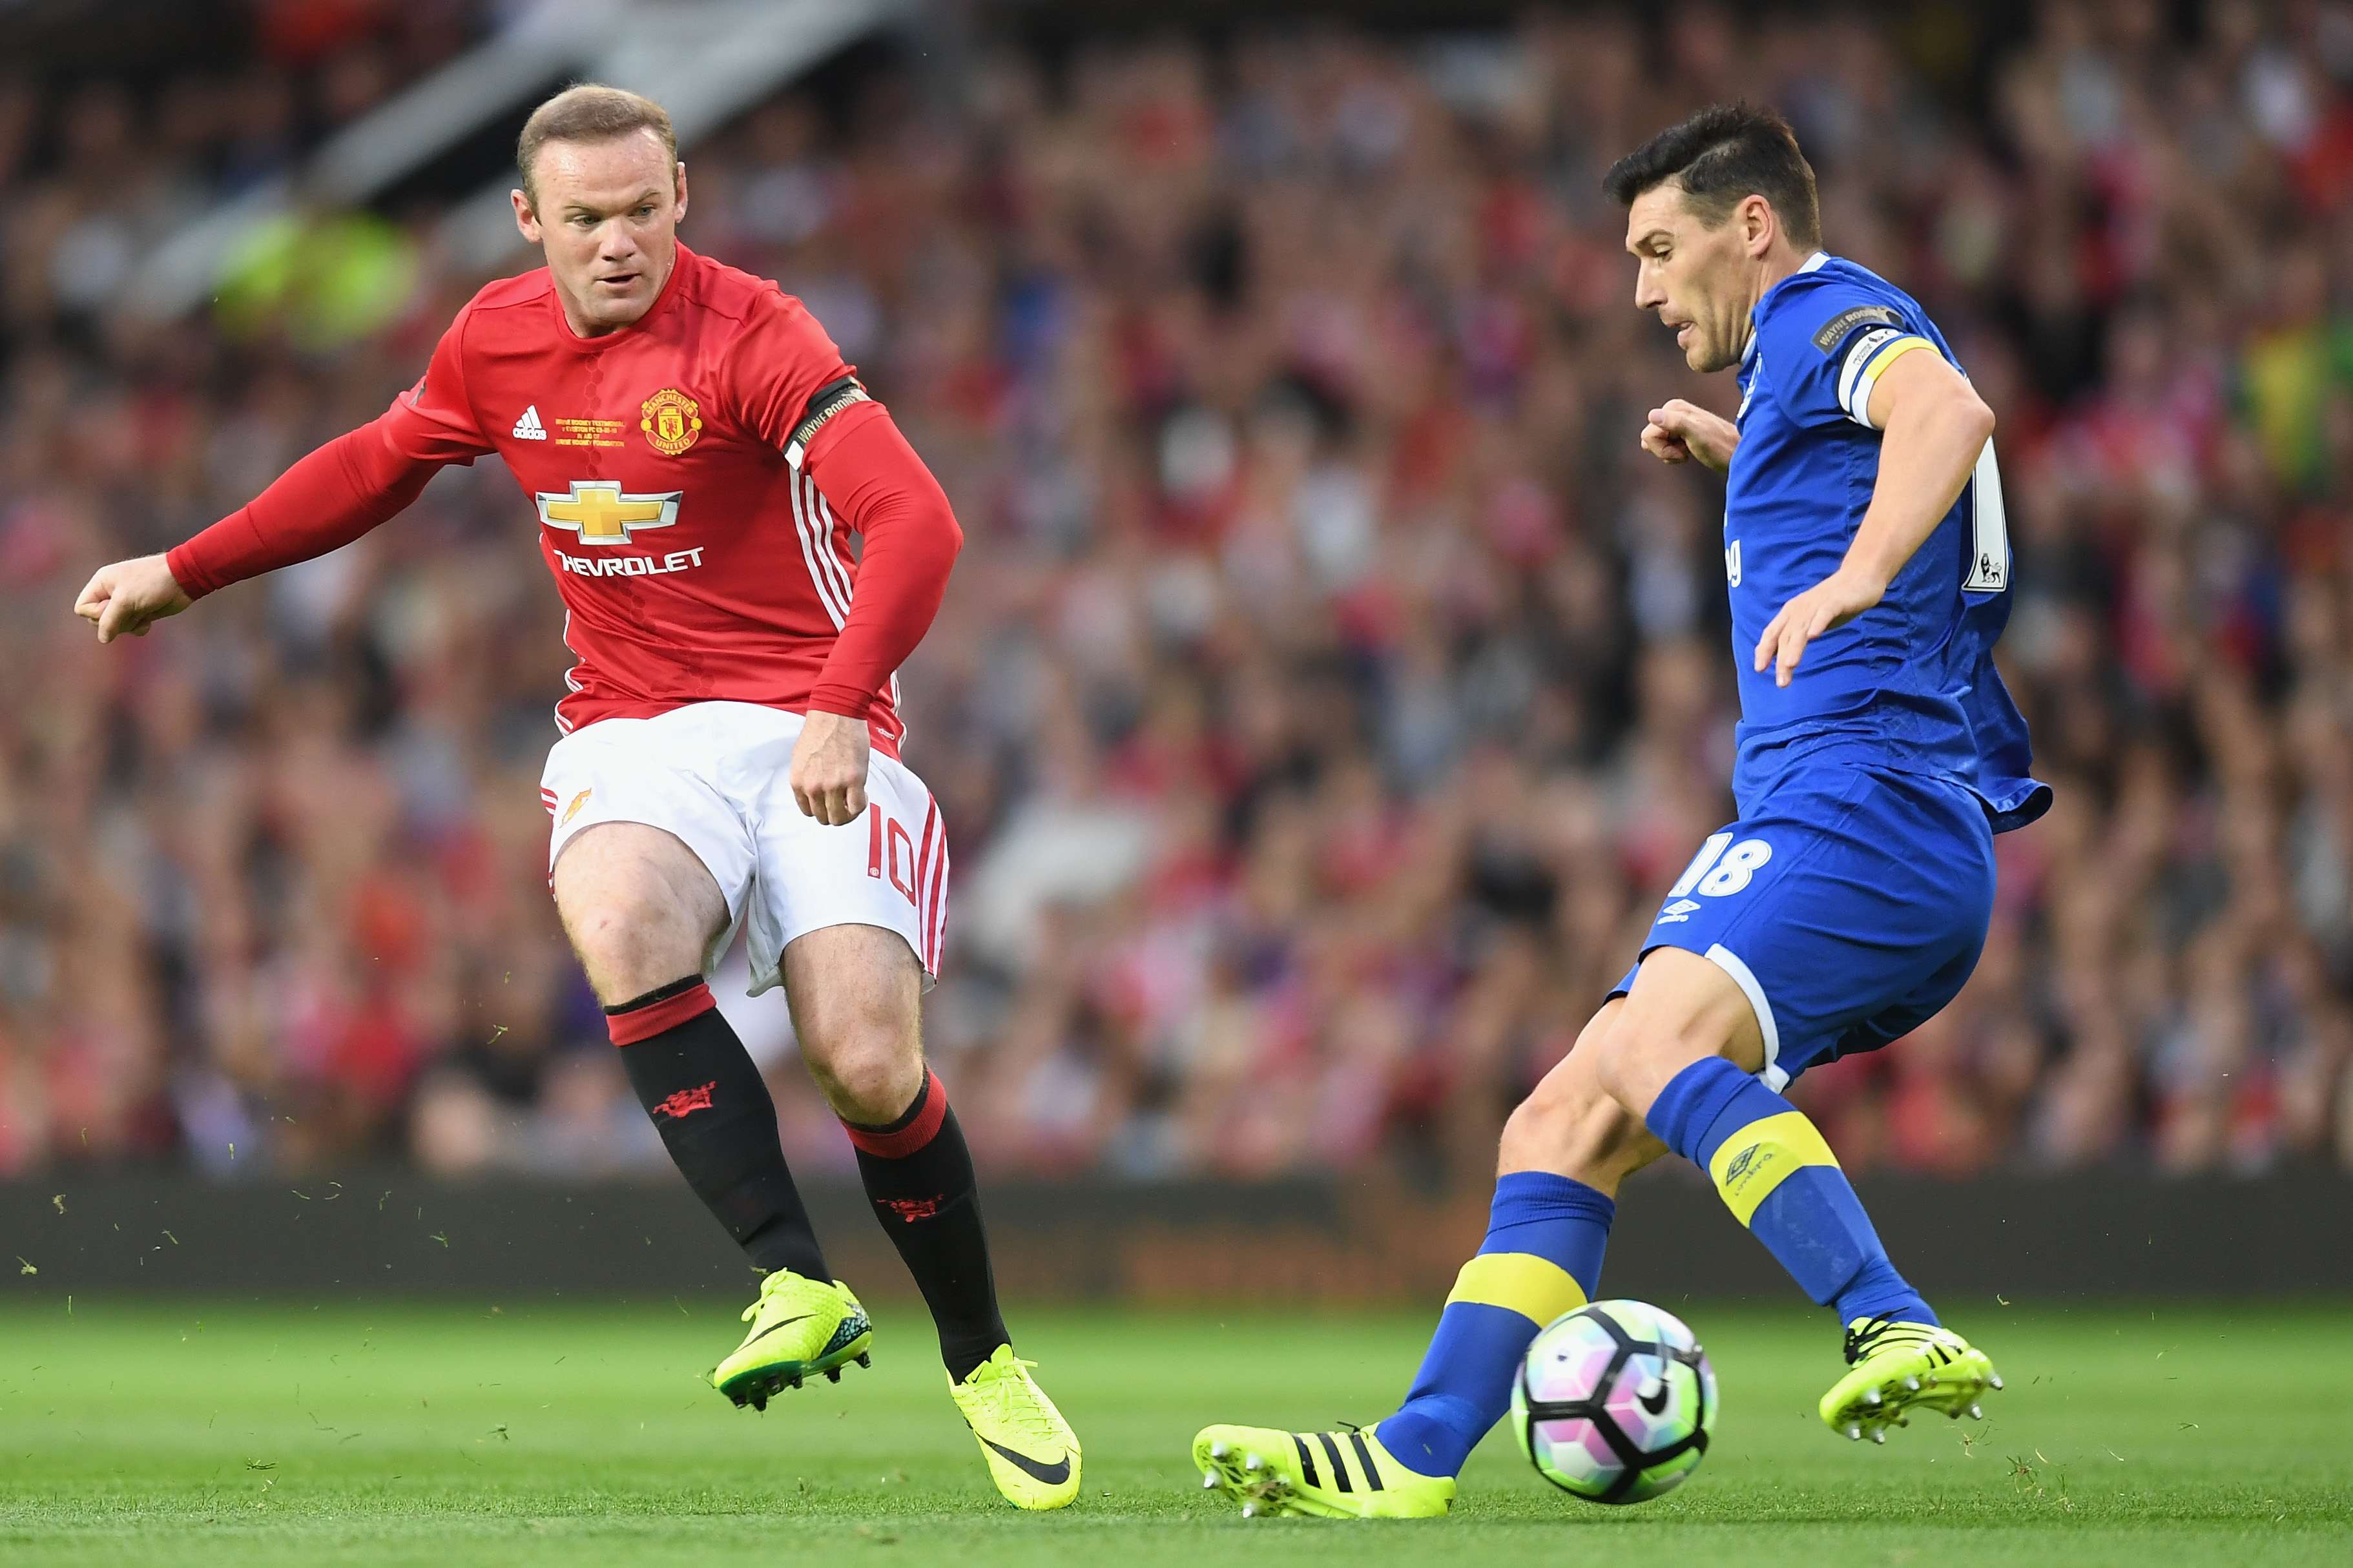 Wayne Rooney Testimonial: Manchester United v Everton